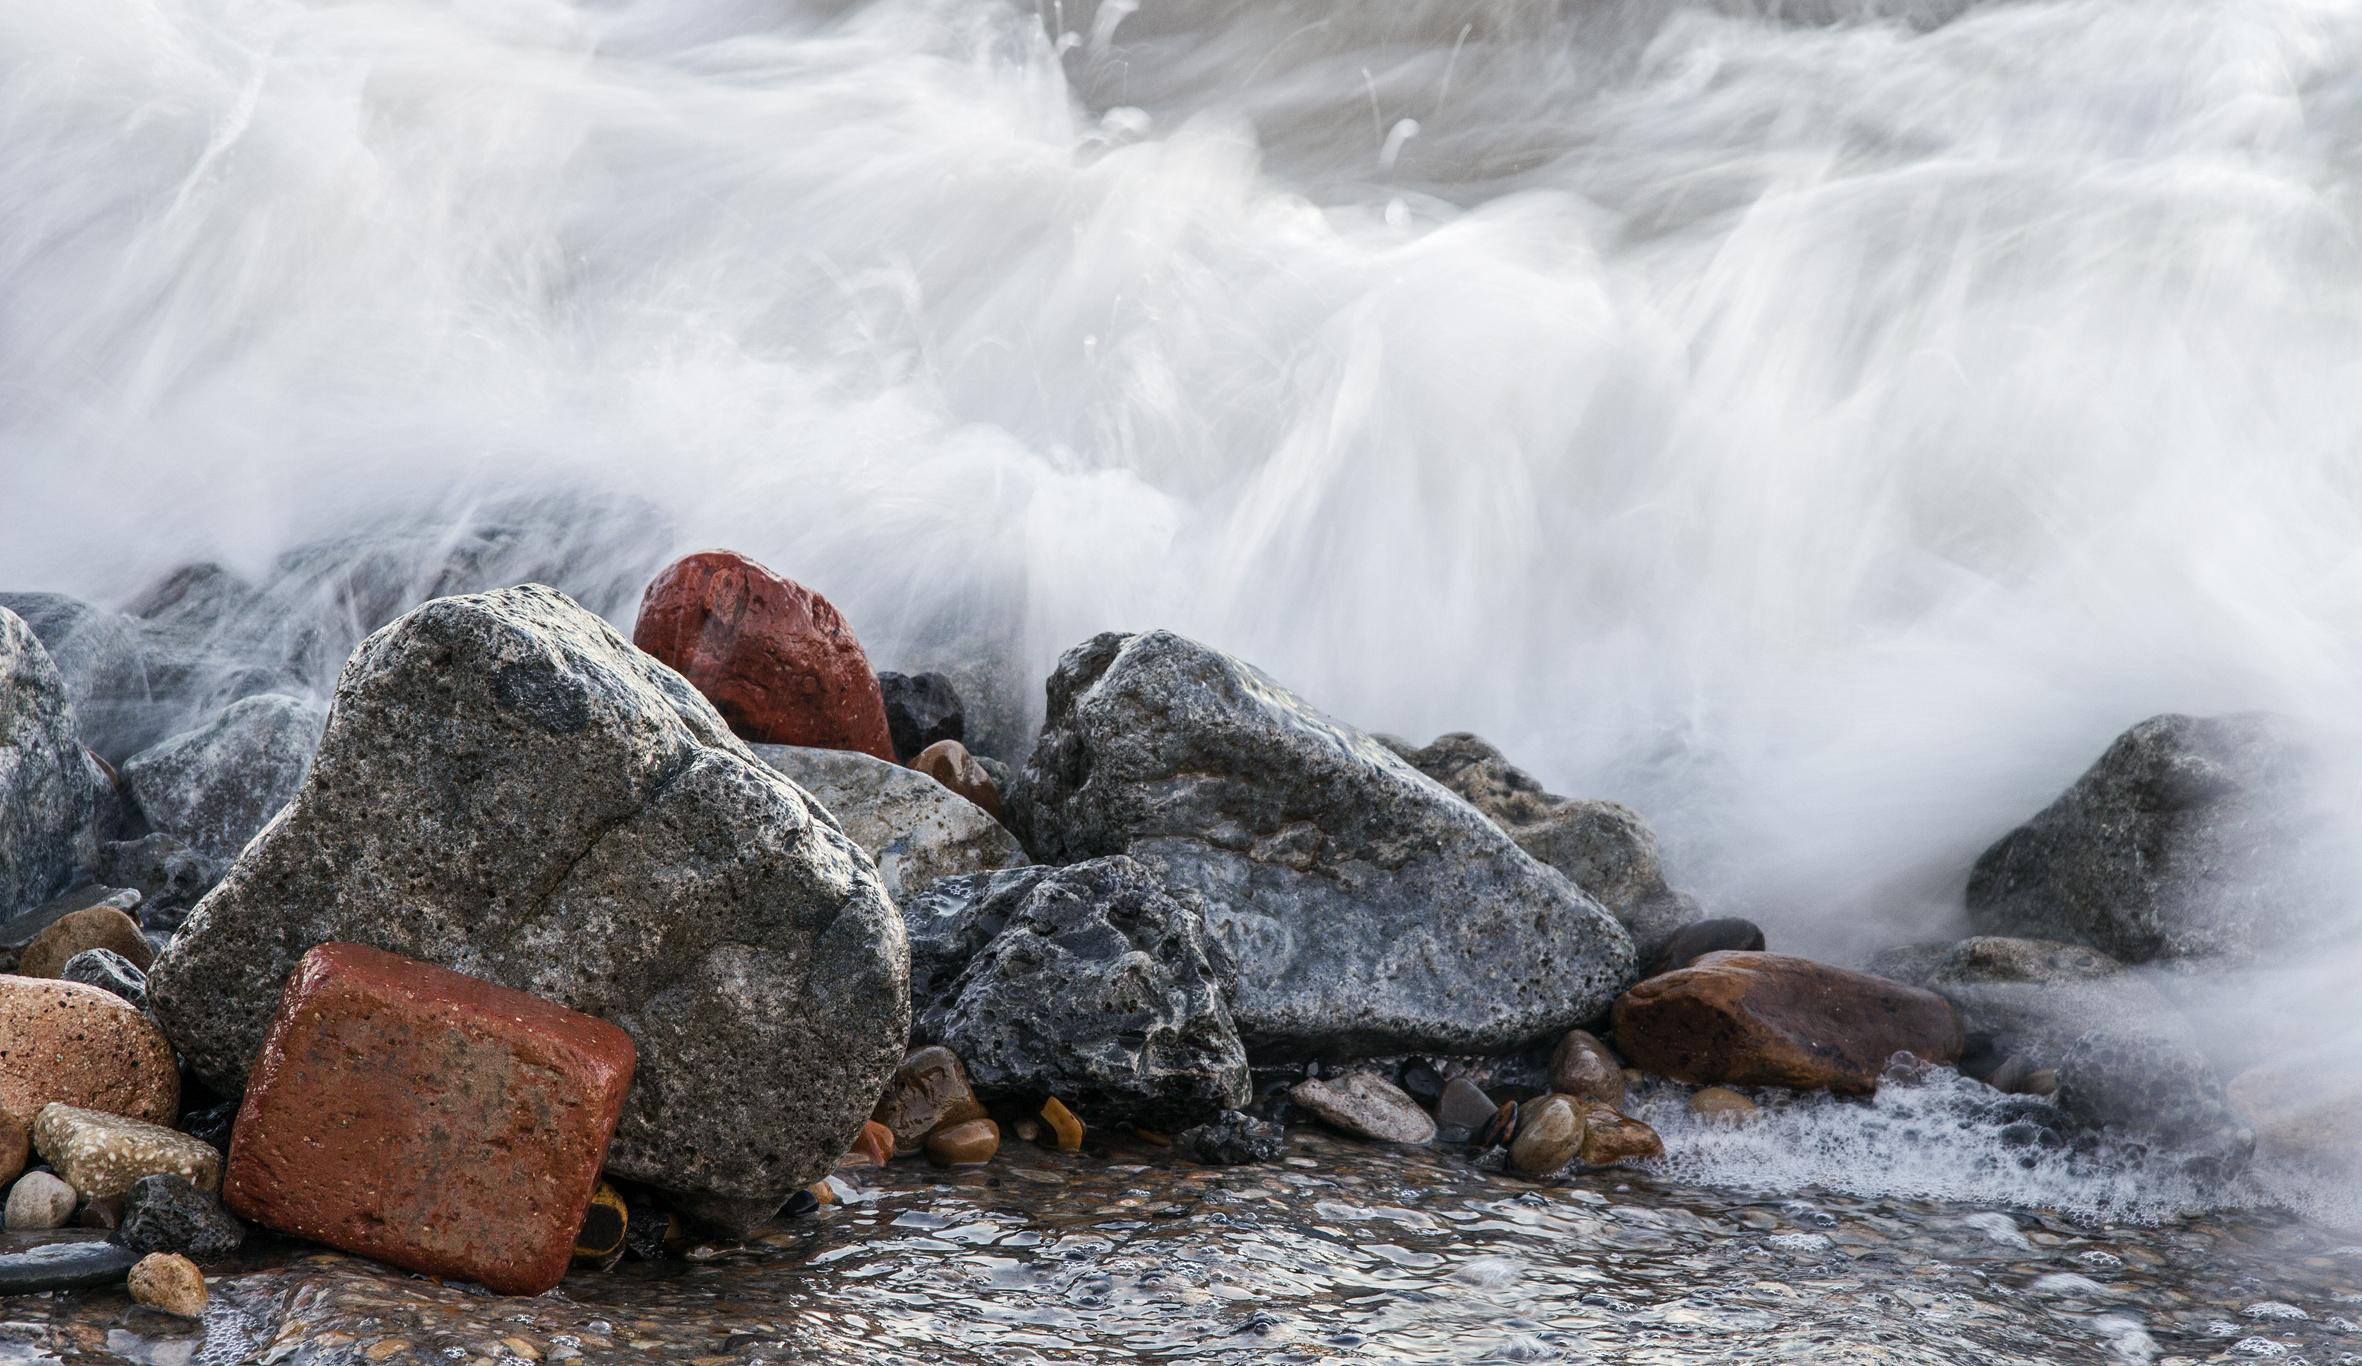 Skinningrove - incoming tide